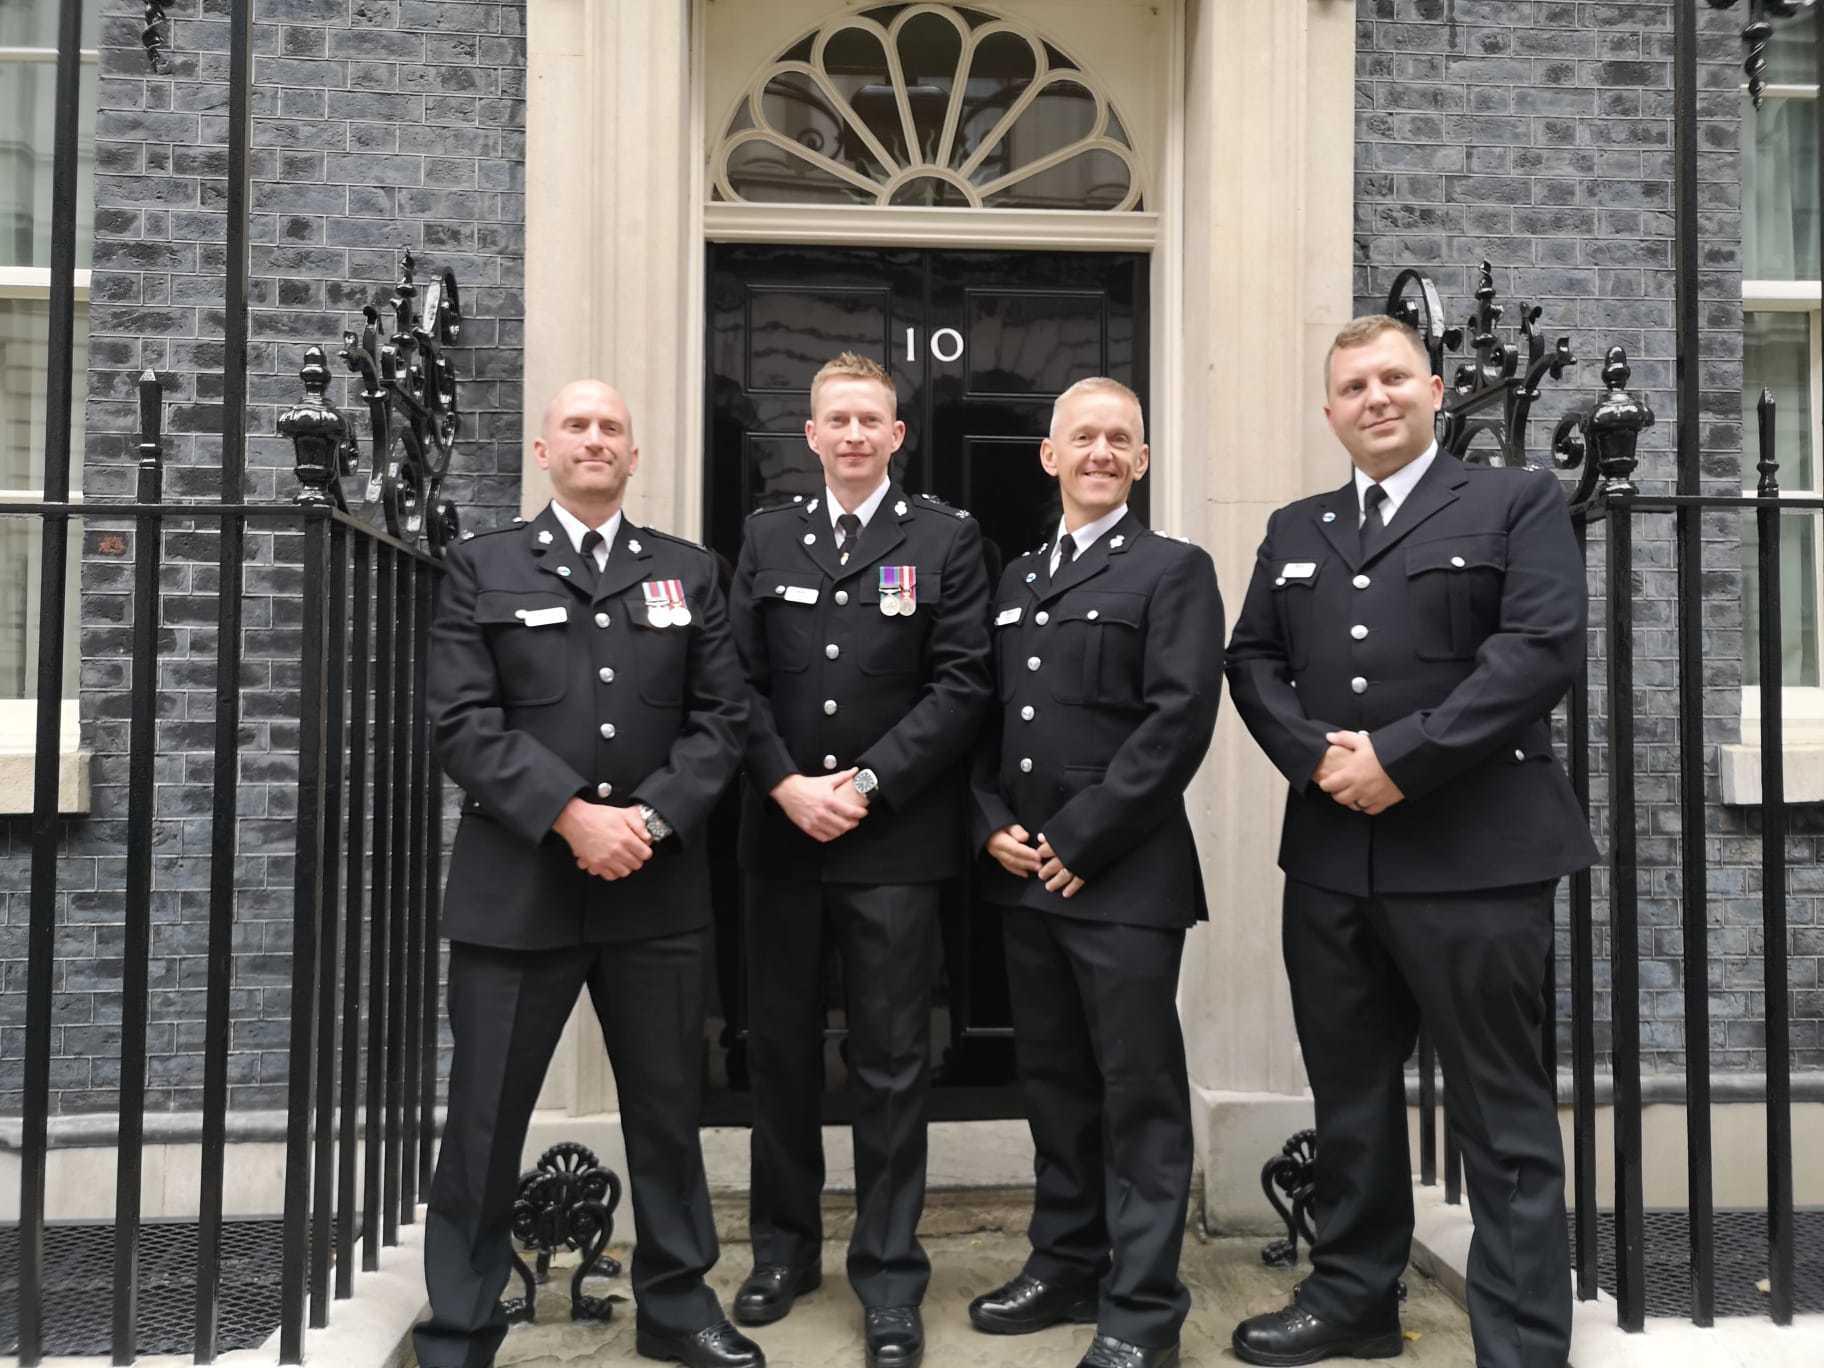 Petugas polisi diserang di Darwen 'merasa terhormat' telah menghadiri Penghargaan Keberanian meskipun kalah